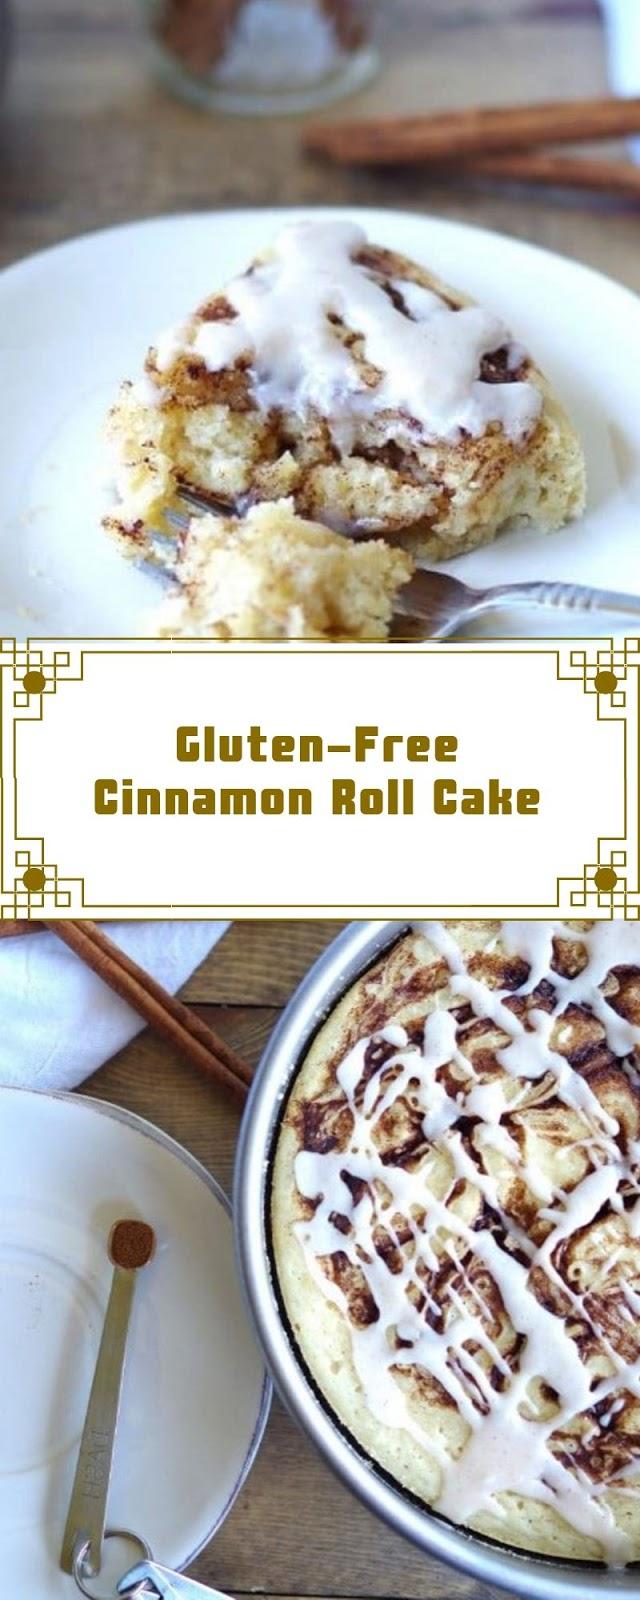 Gluten-Free Cinnamon Roll Cake